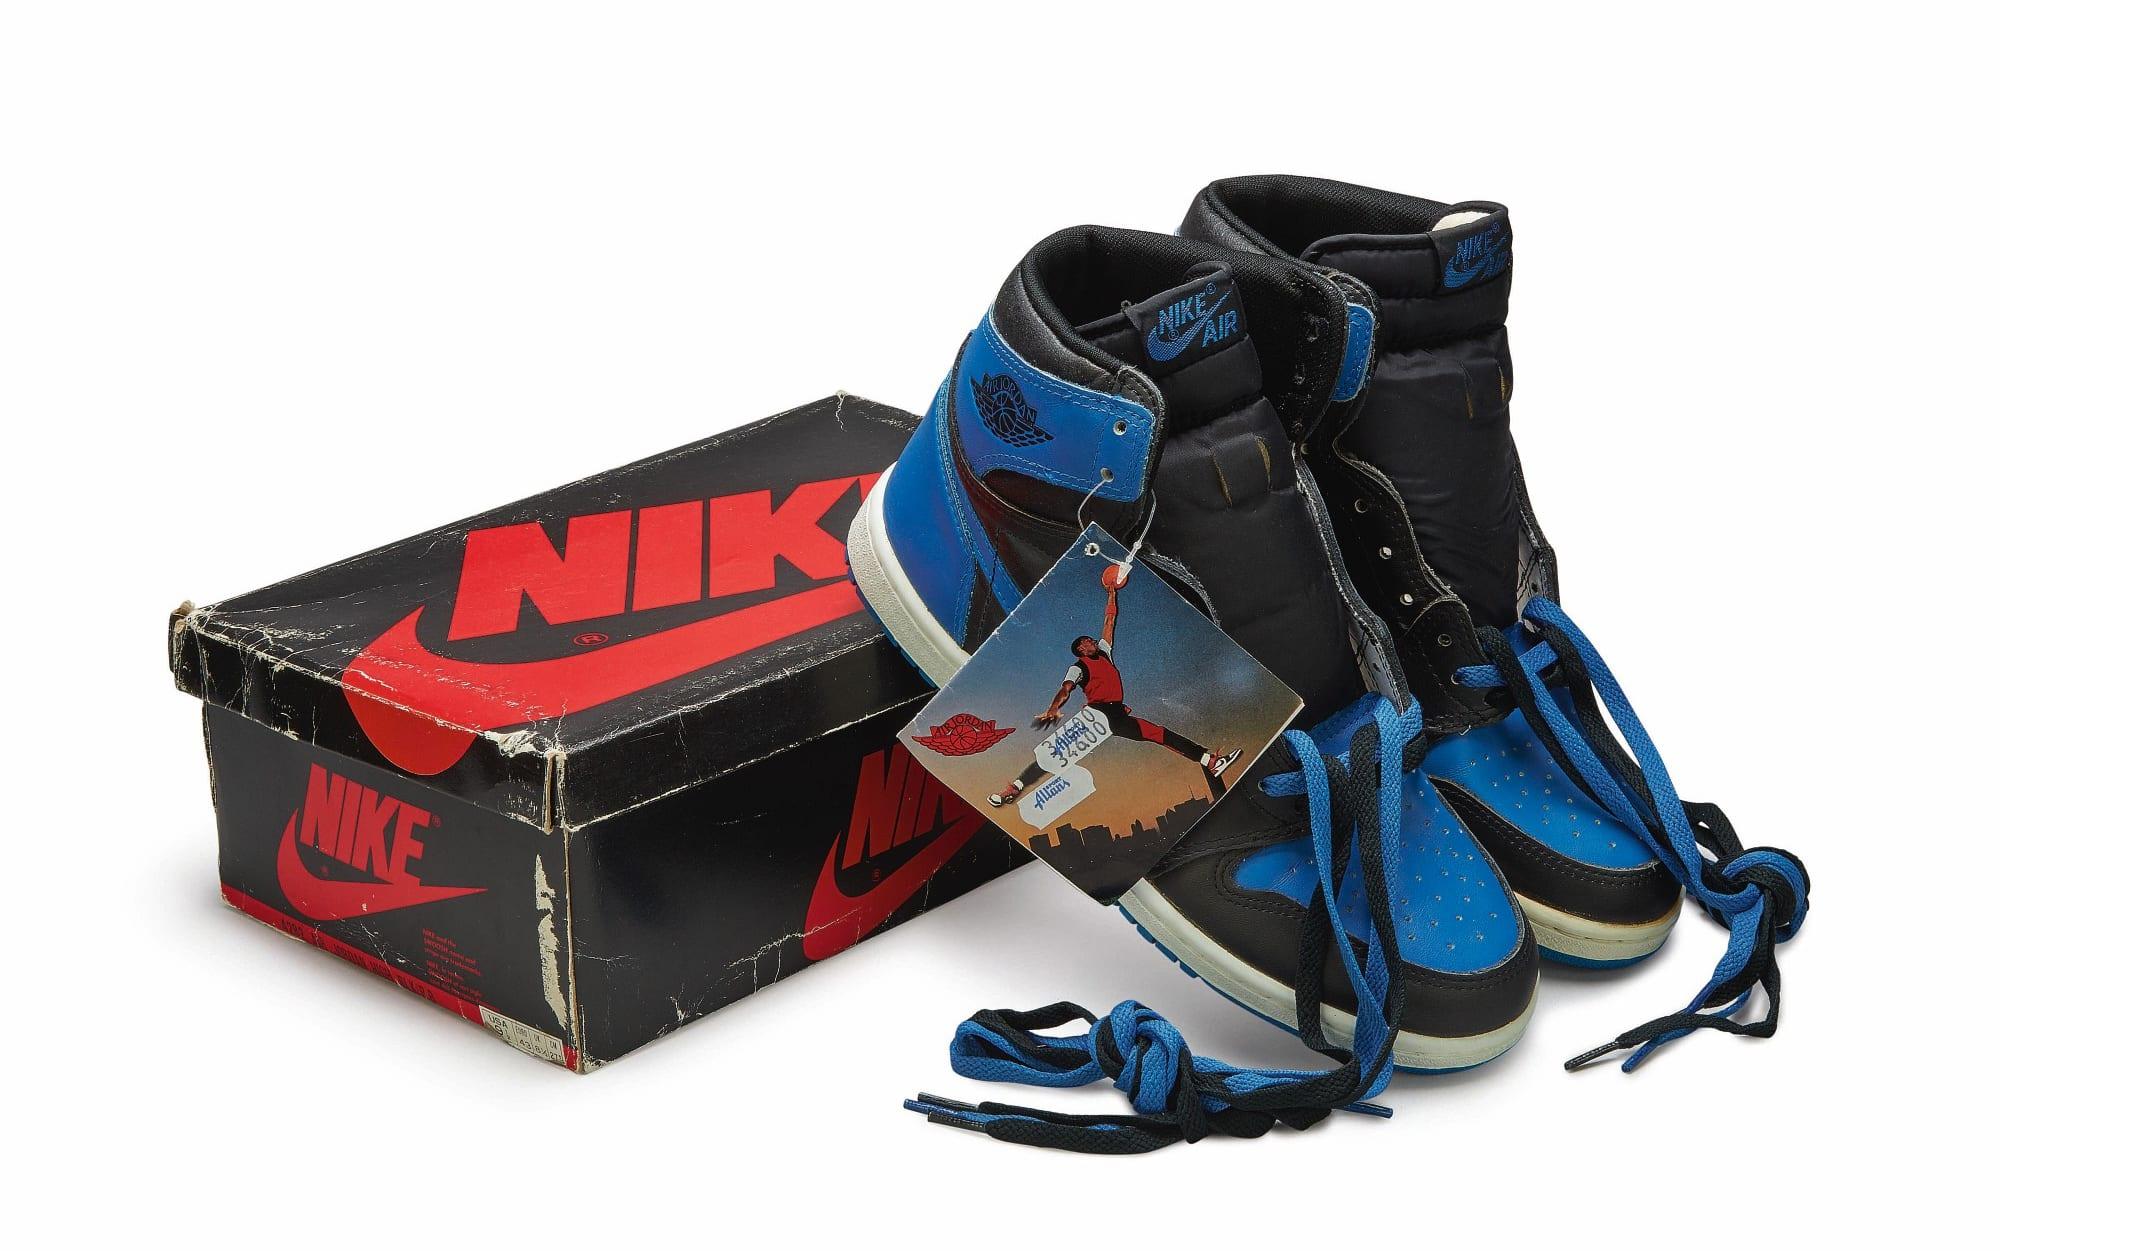 Nike Air Jordan 1 High OG (1985) 'Royal', Foto: Sotheby's